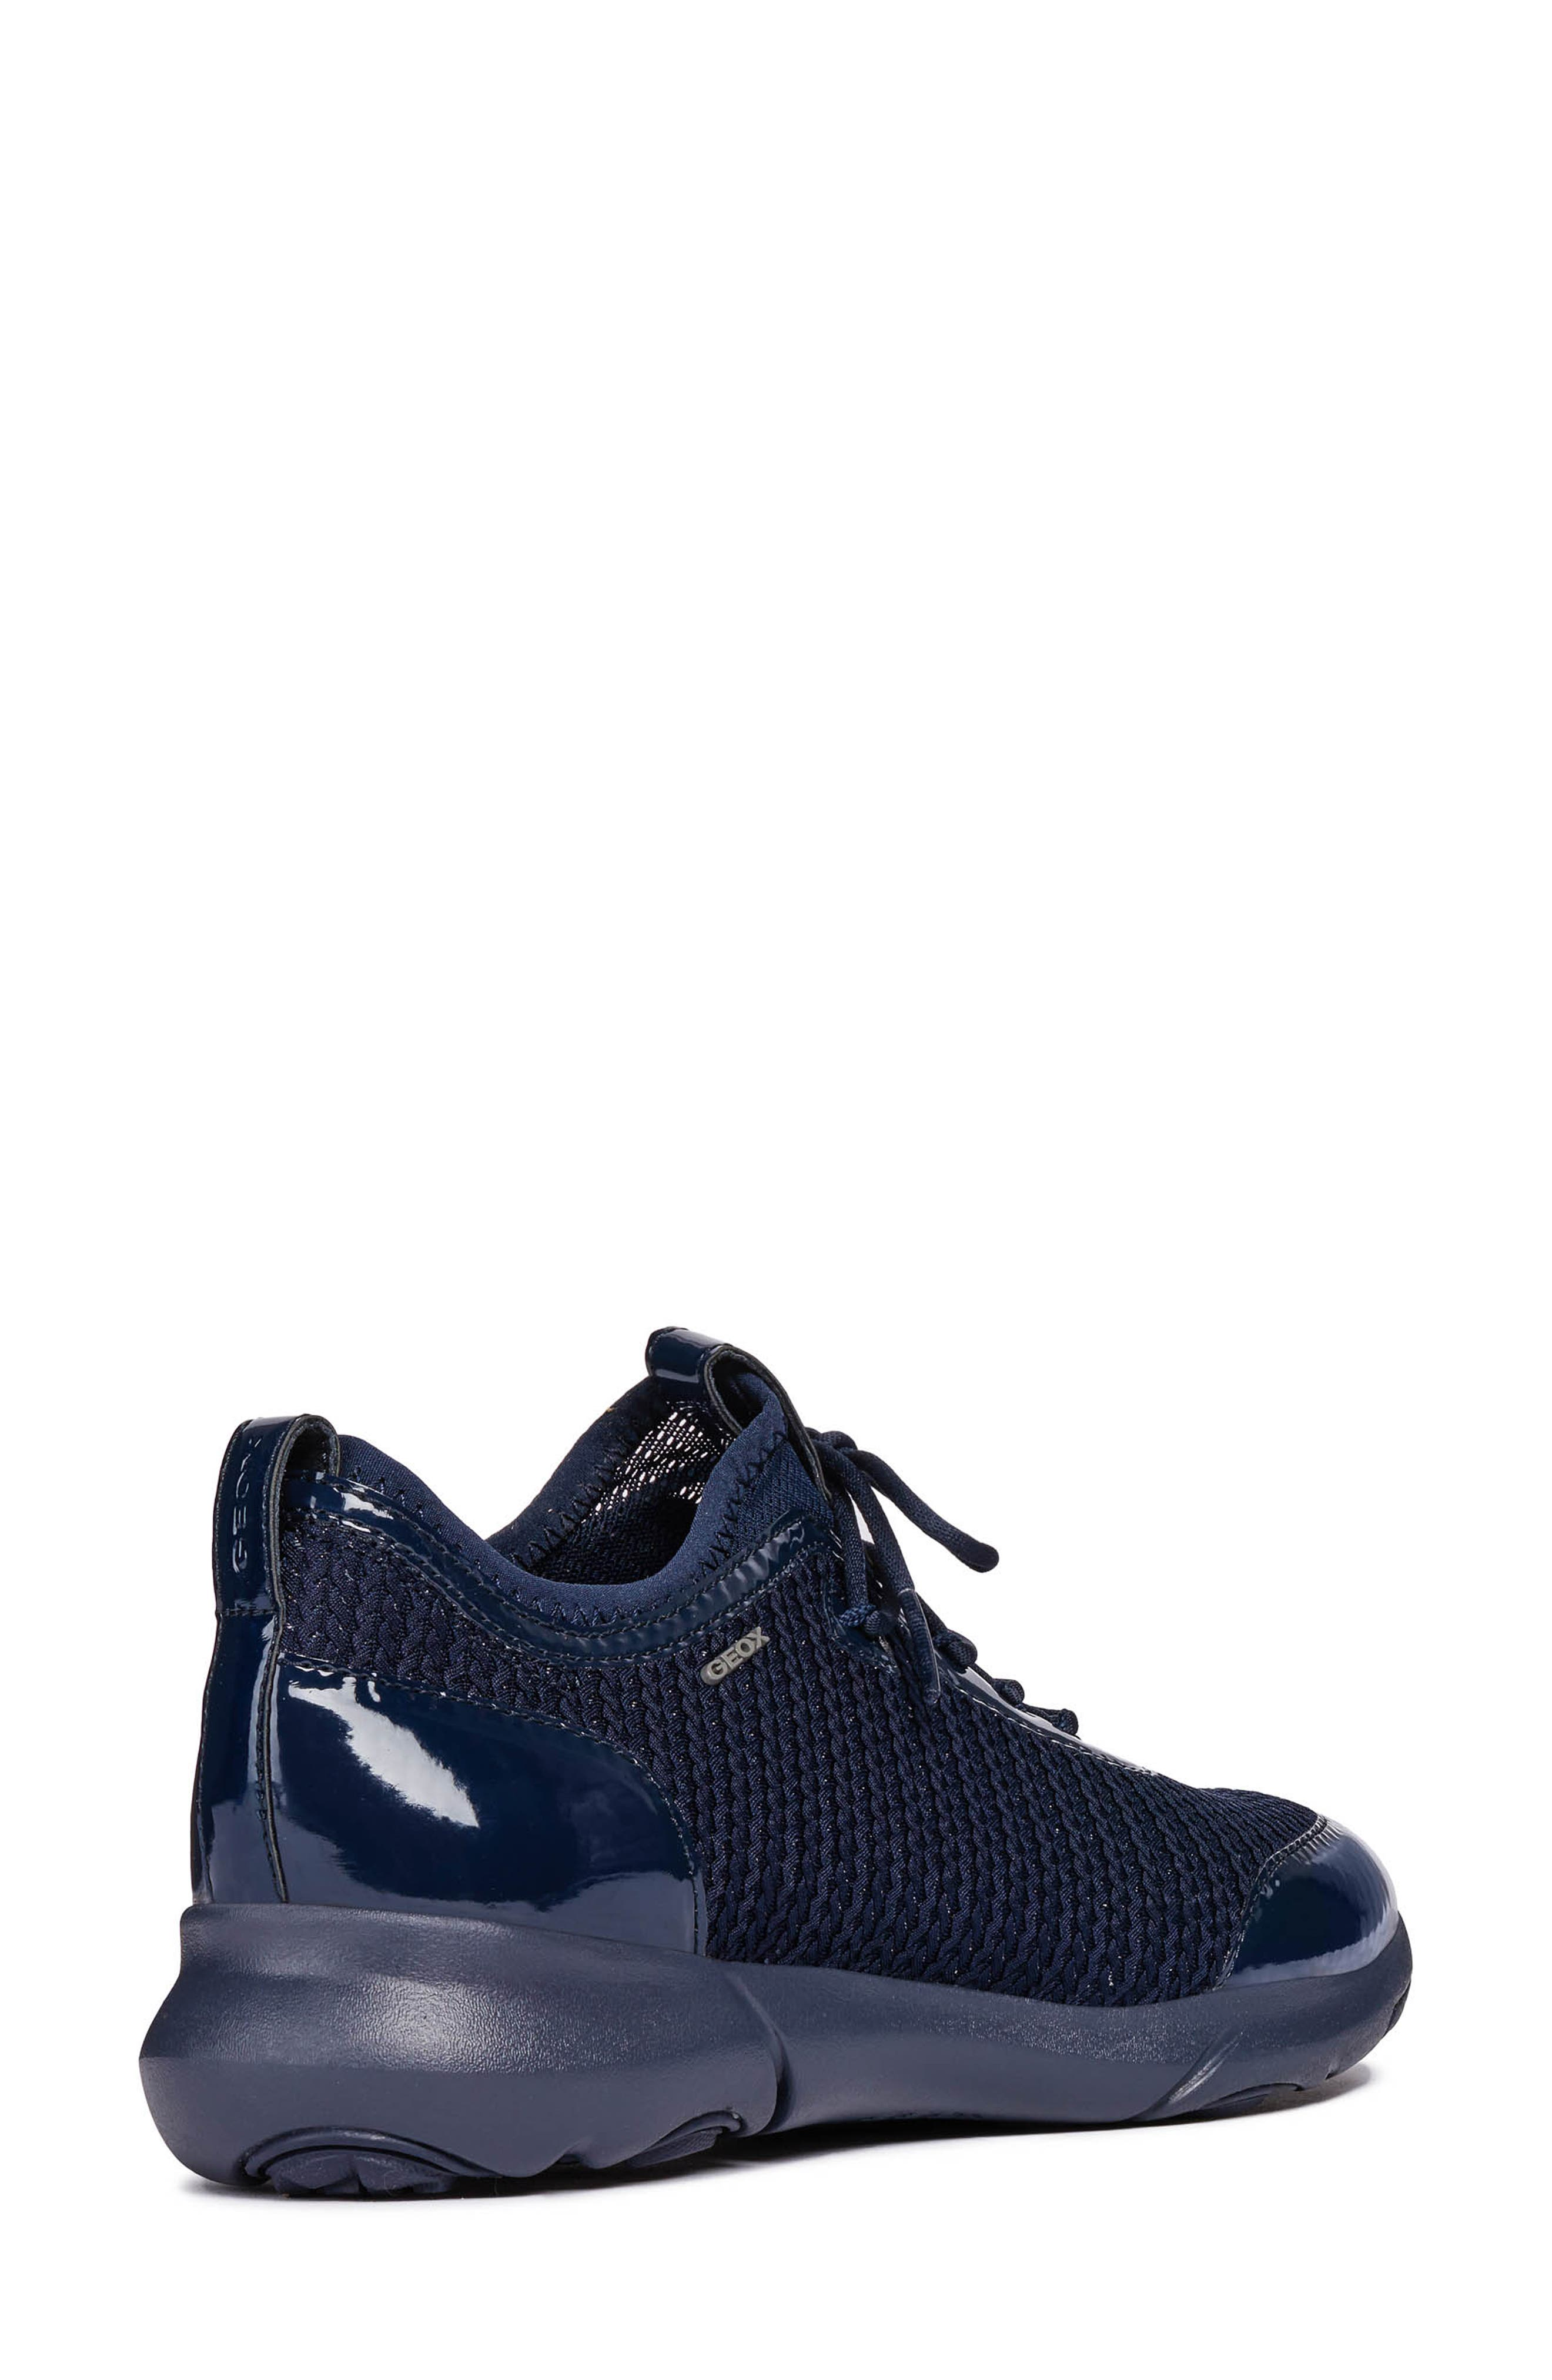 Nebula X Sneaker,                             Alternate thumbnail 2, color,                             NAVY FABRIC